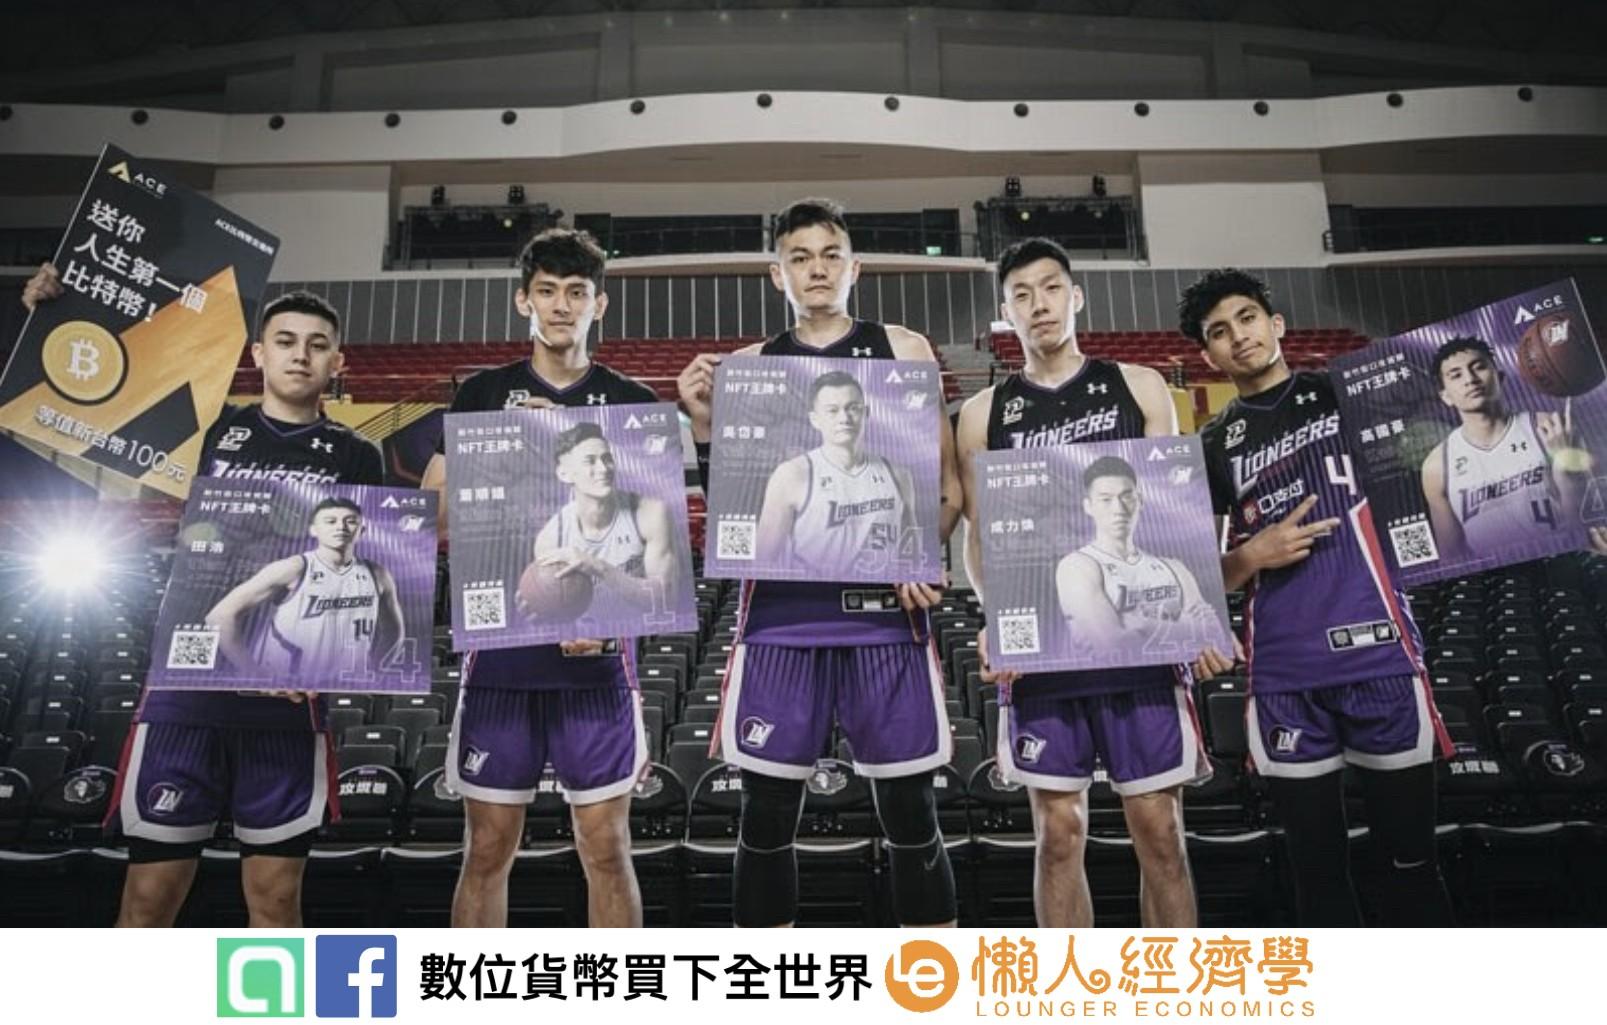 ACE與街口新竹攻城獅合作打造台灣首款職籃NFT